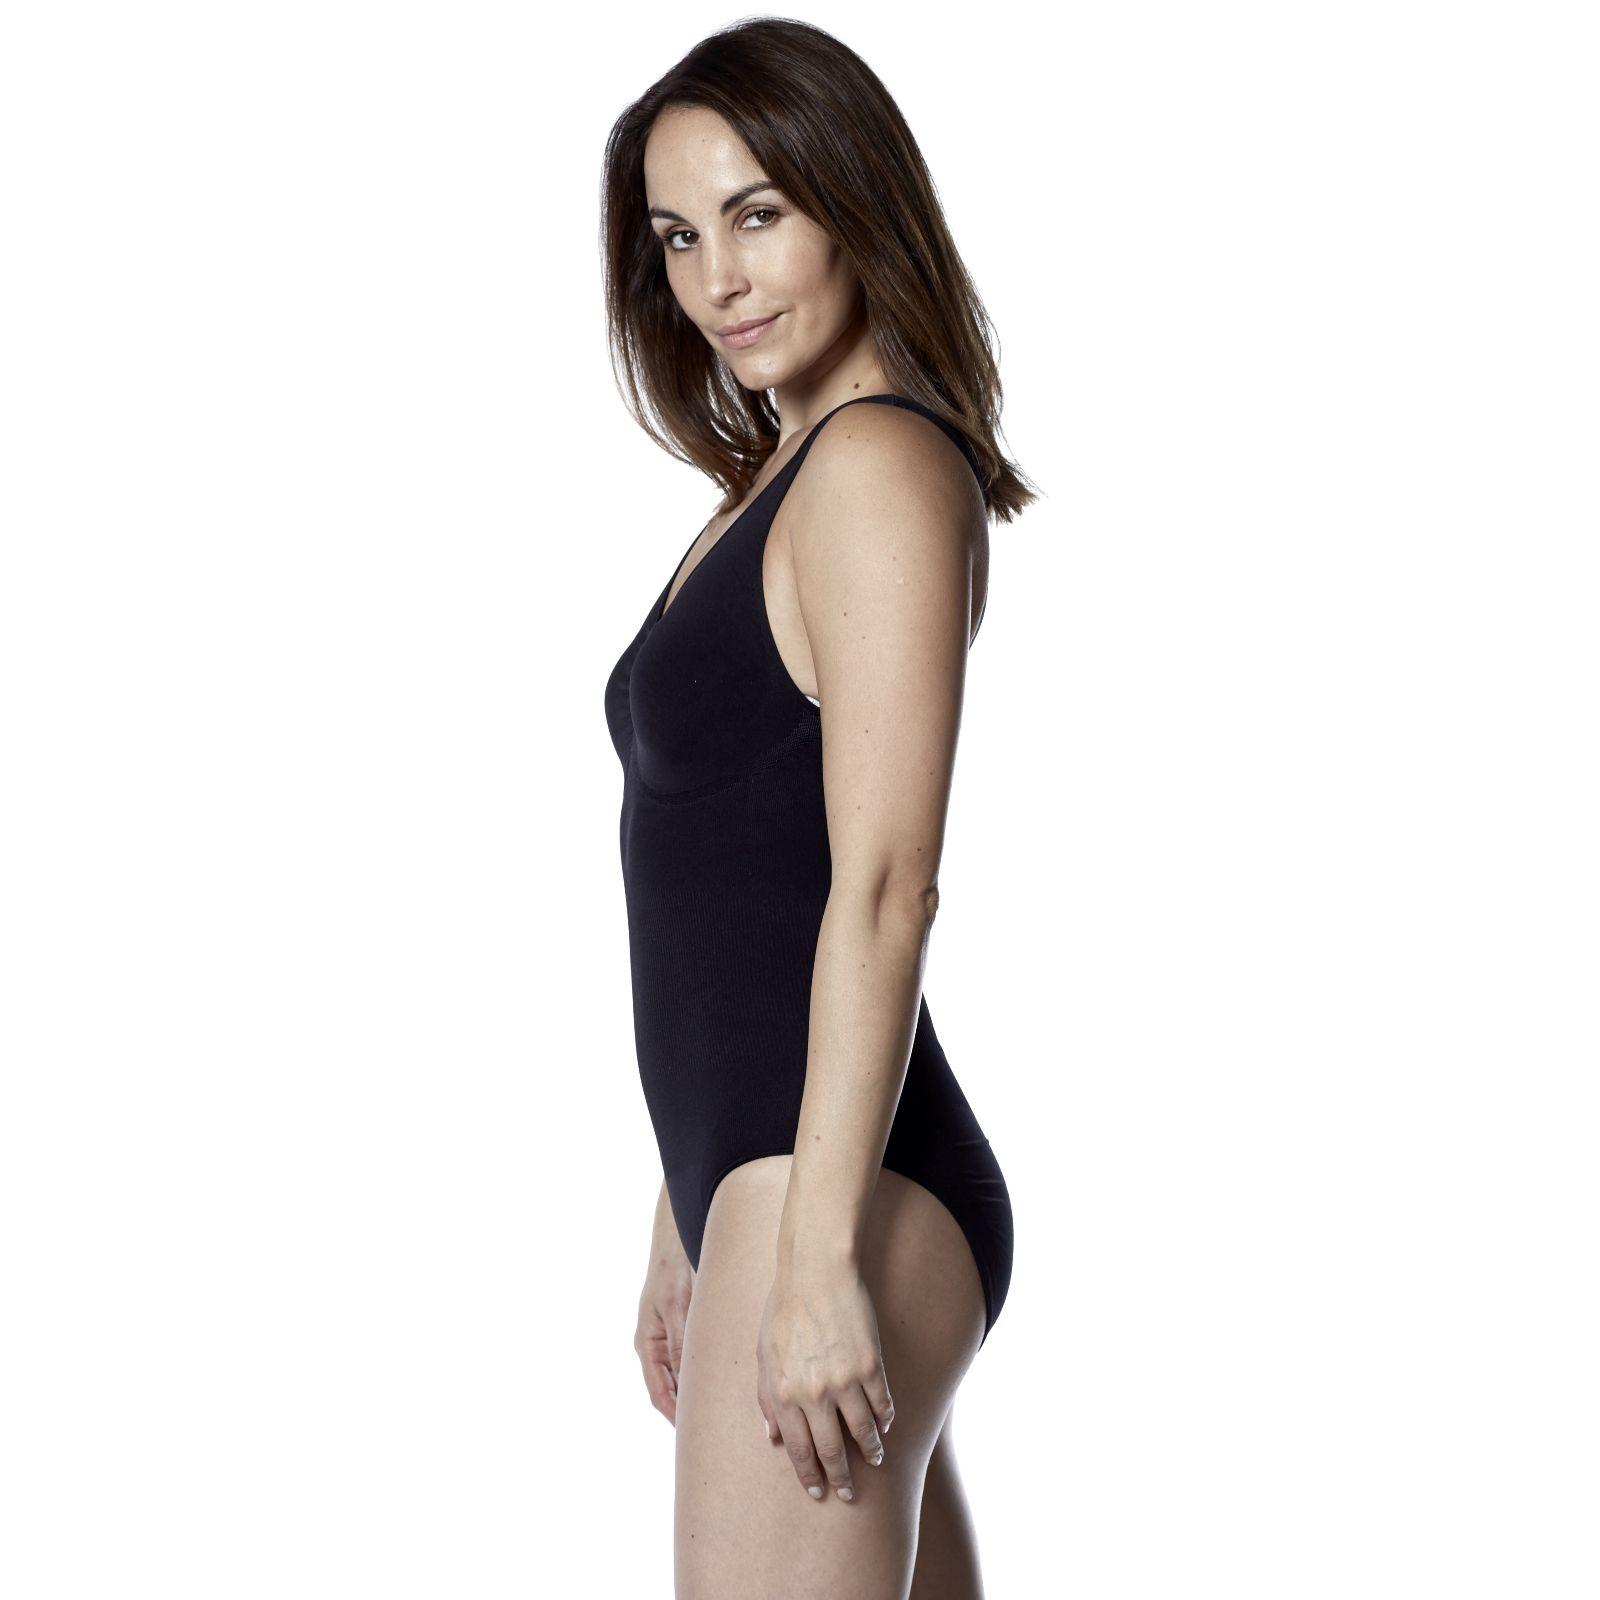 Shop For Cheap Vercella Vita Bodysuit Sandlewood Medium Control Size Large Women's Clothing Intimates & Sleep